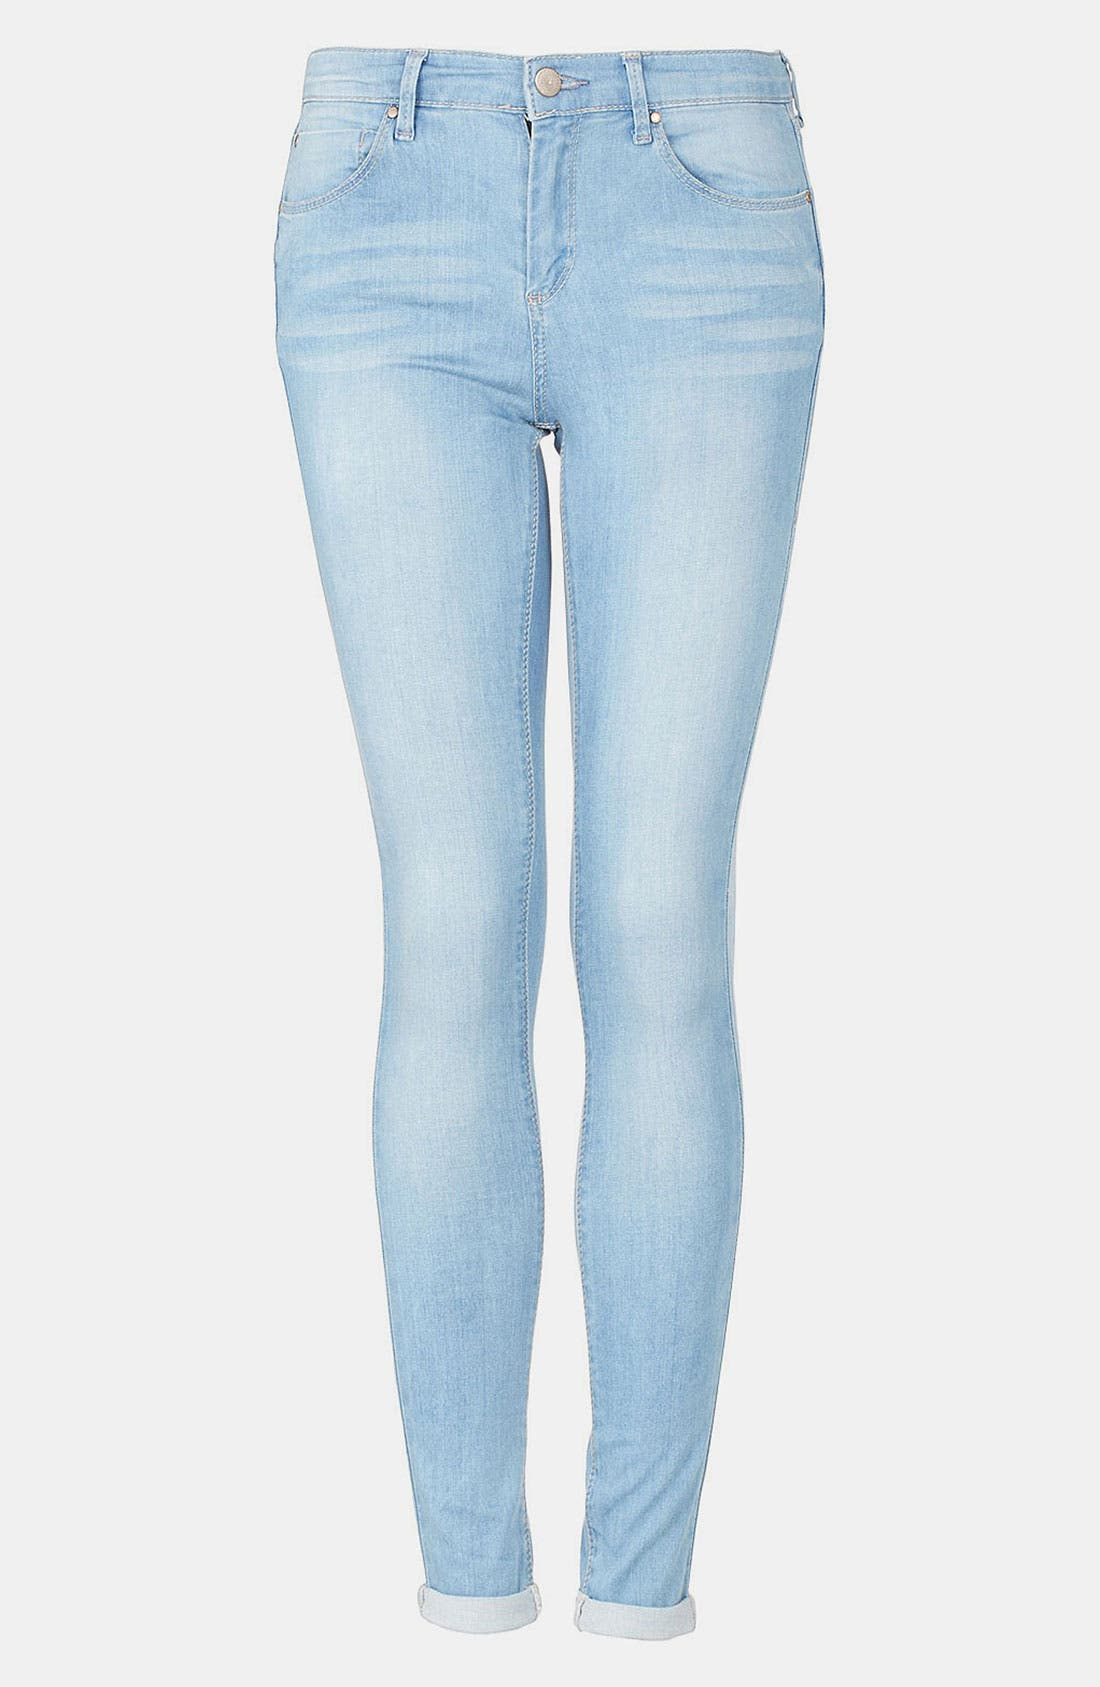 Main Image - Topshop Moto 'Leigh' Bleach Wash Skinny Jeans (Long)